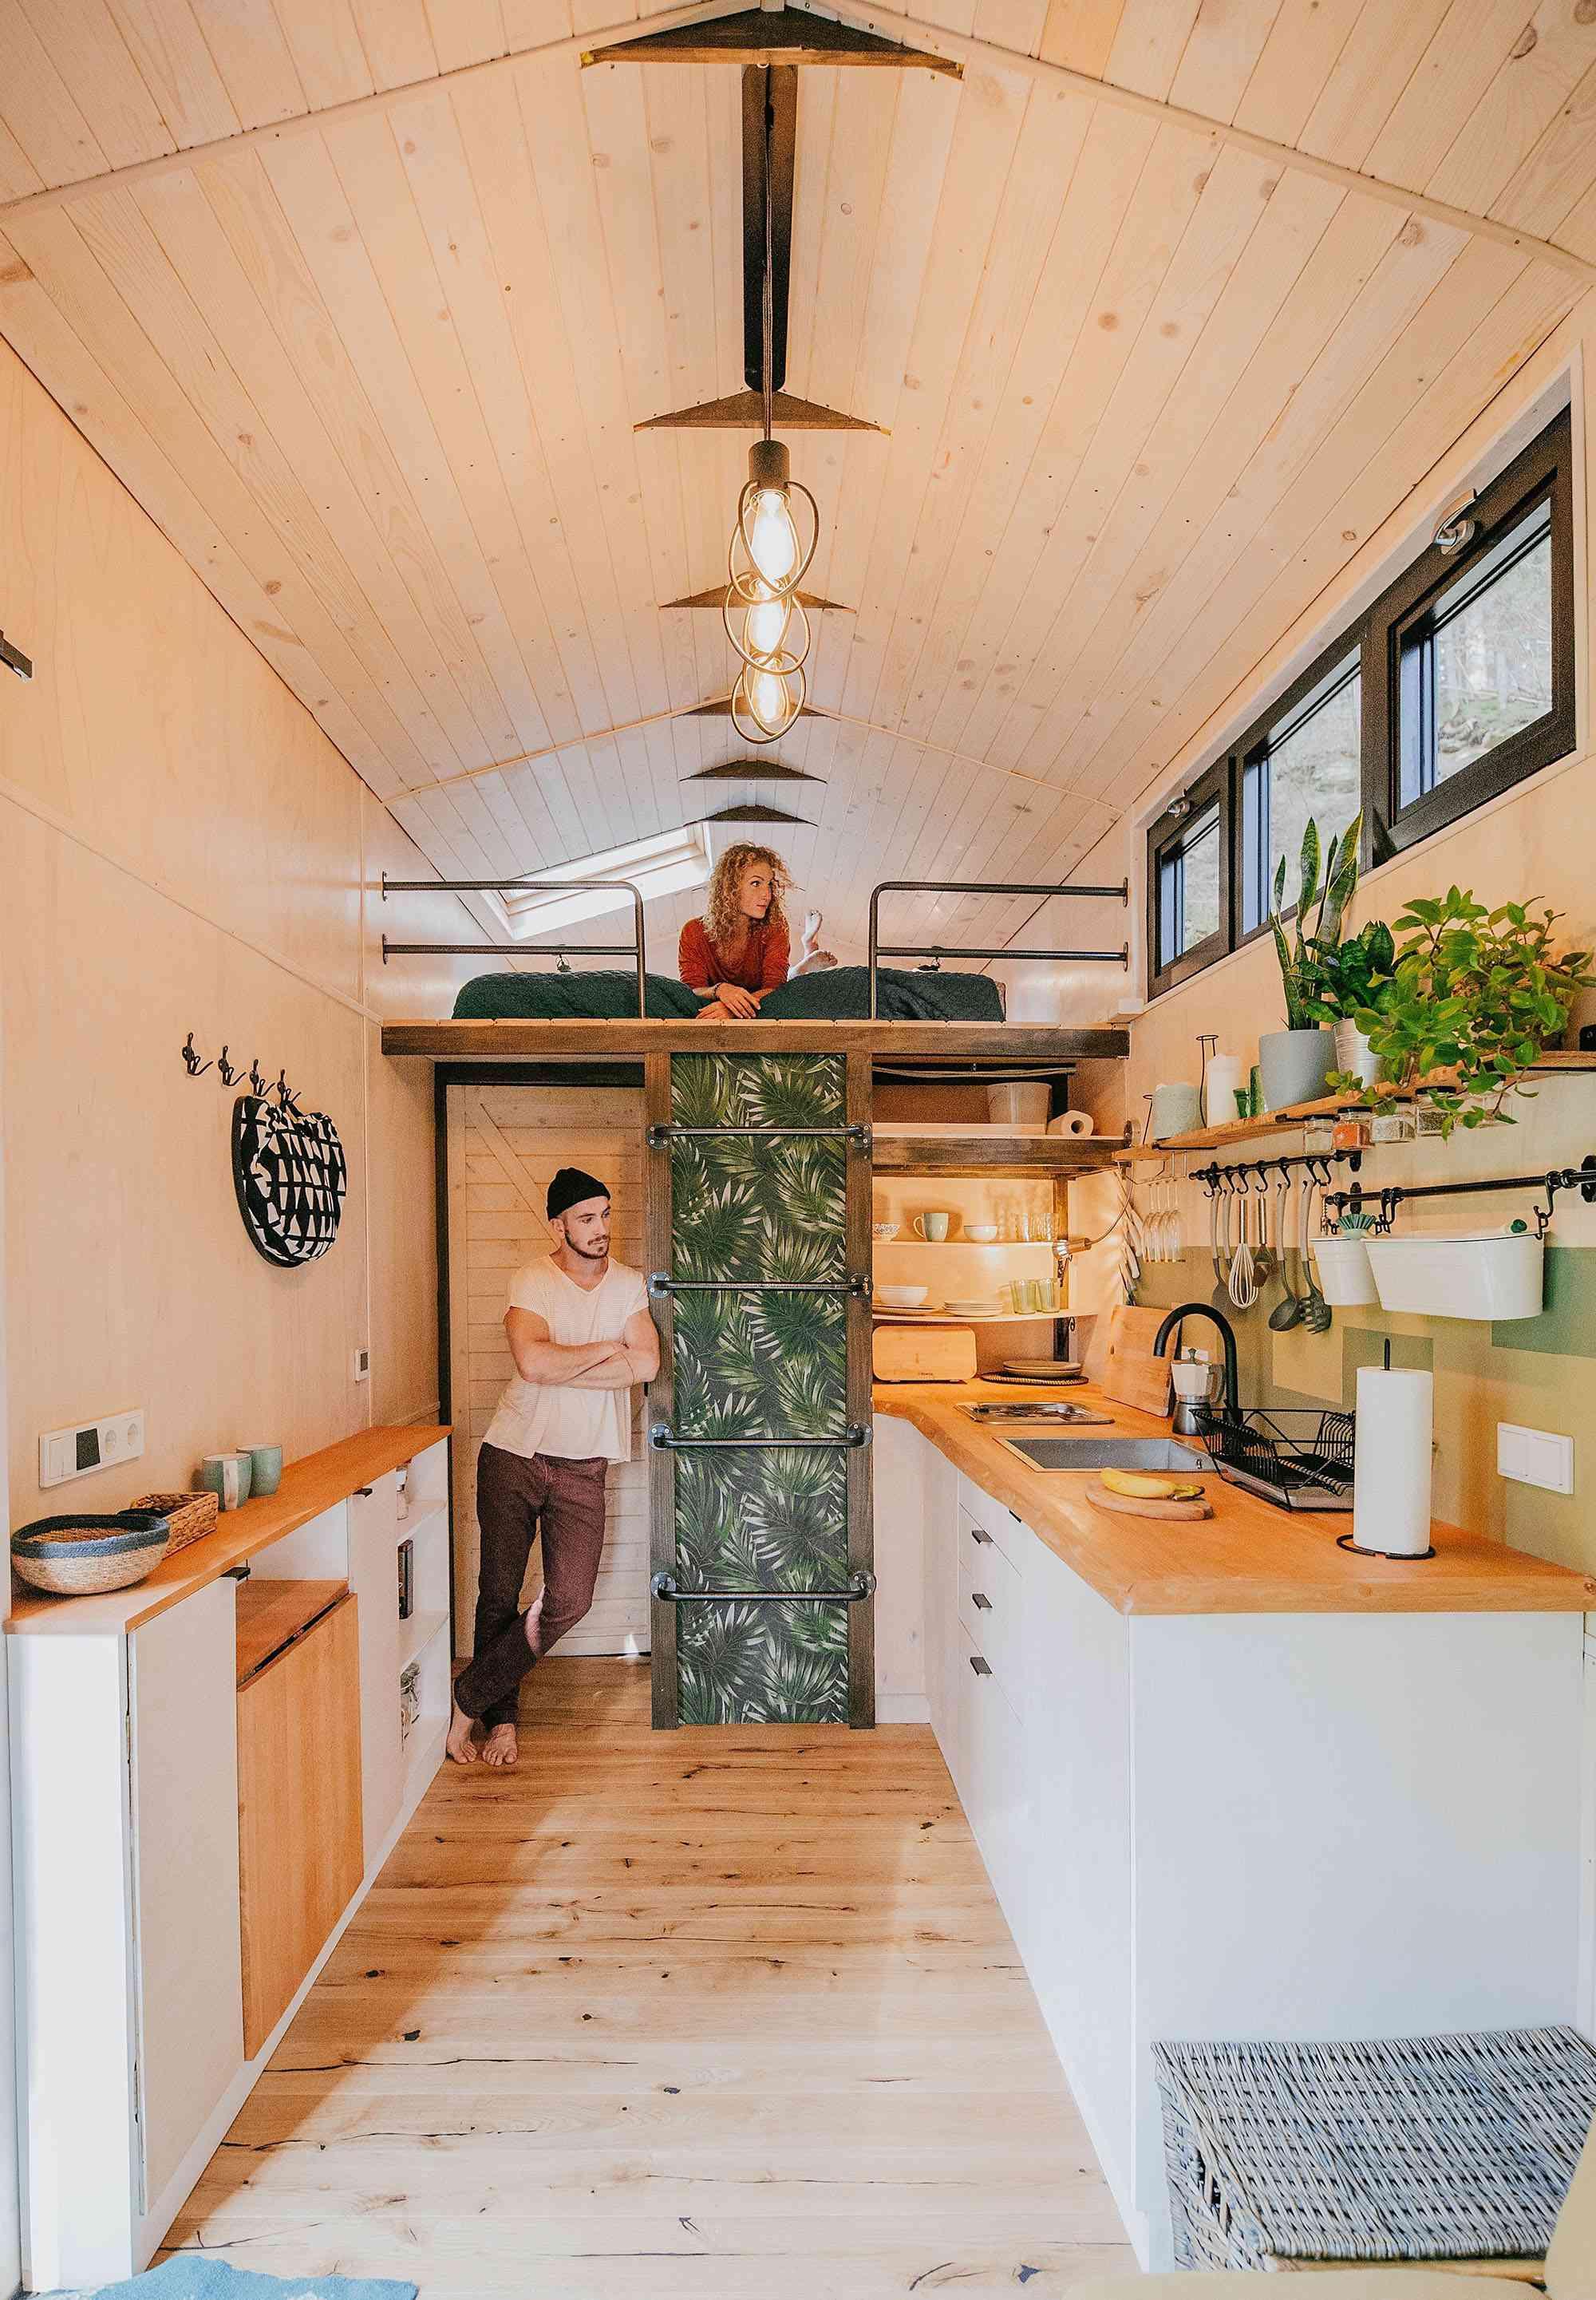 Projekt Datscha modern tiny house kitchen